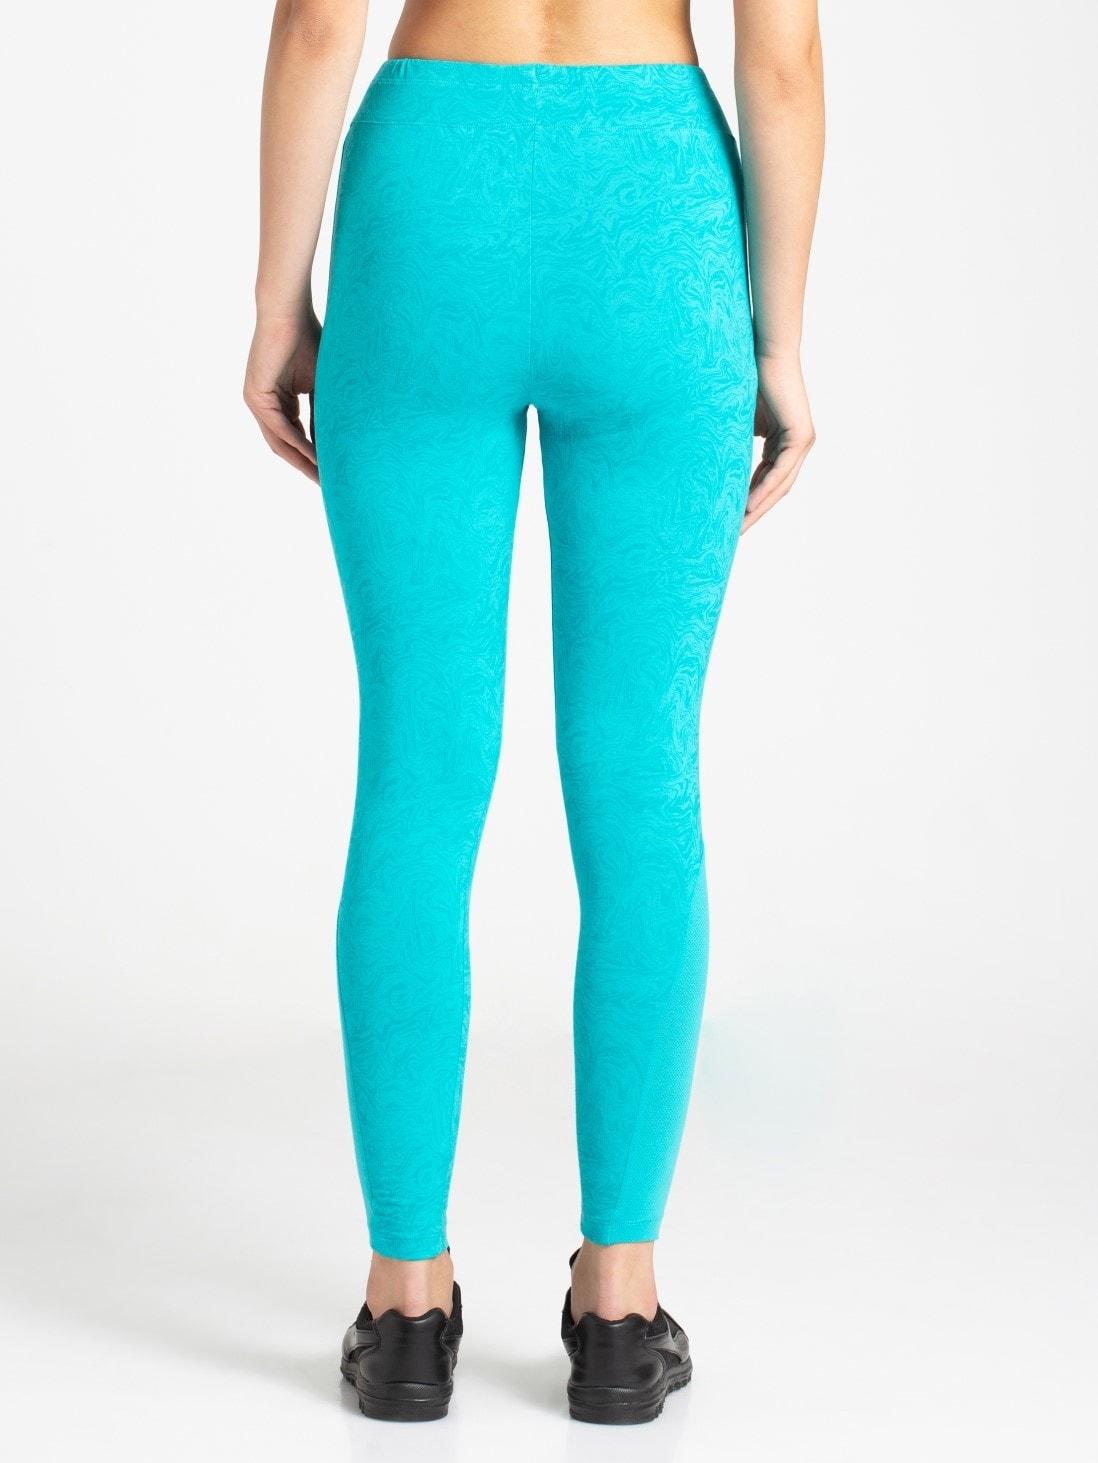 Jockey Womens Teal Printed Yoga Pant (S,Printed Teal)